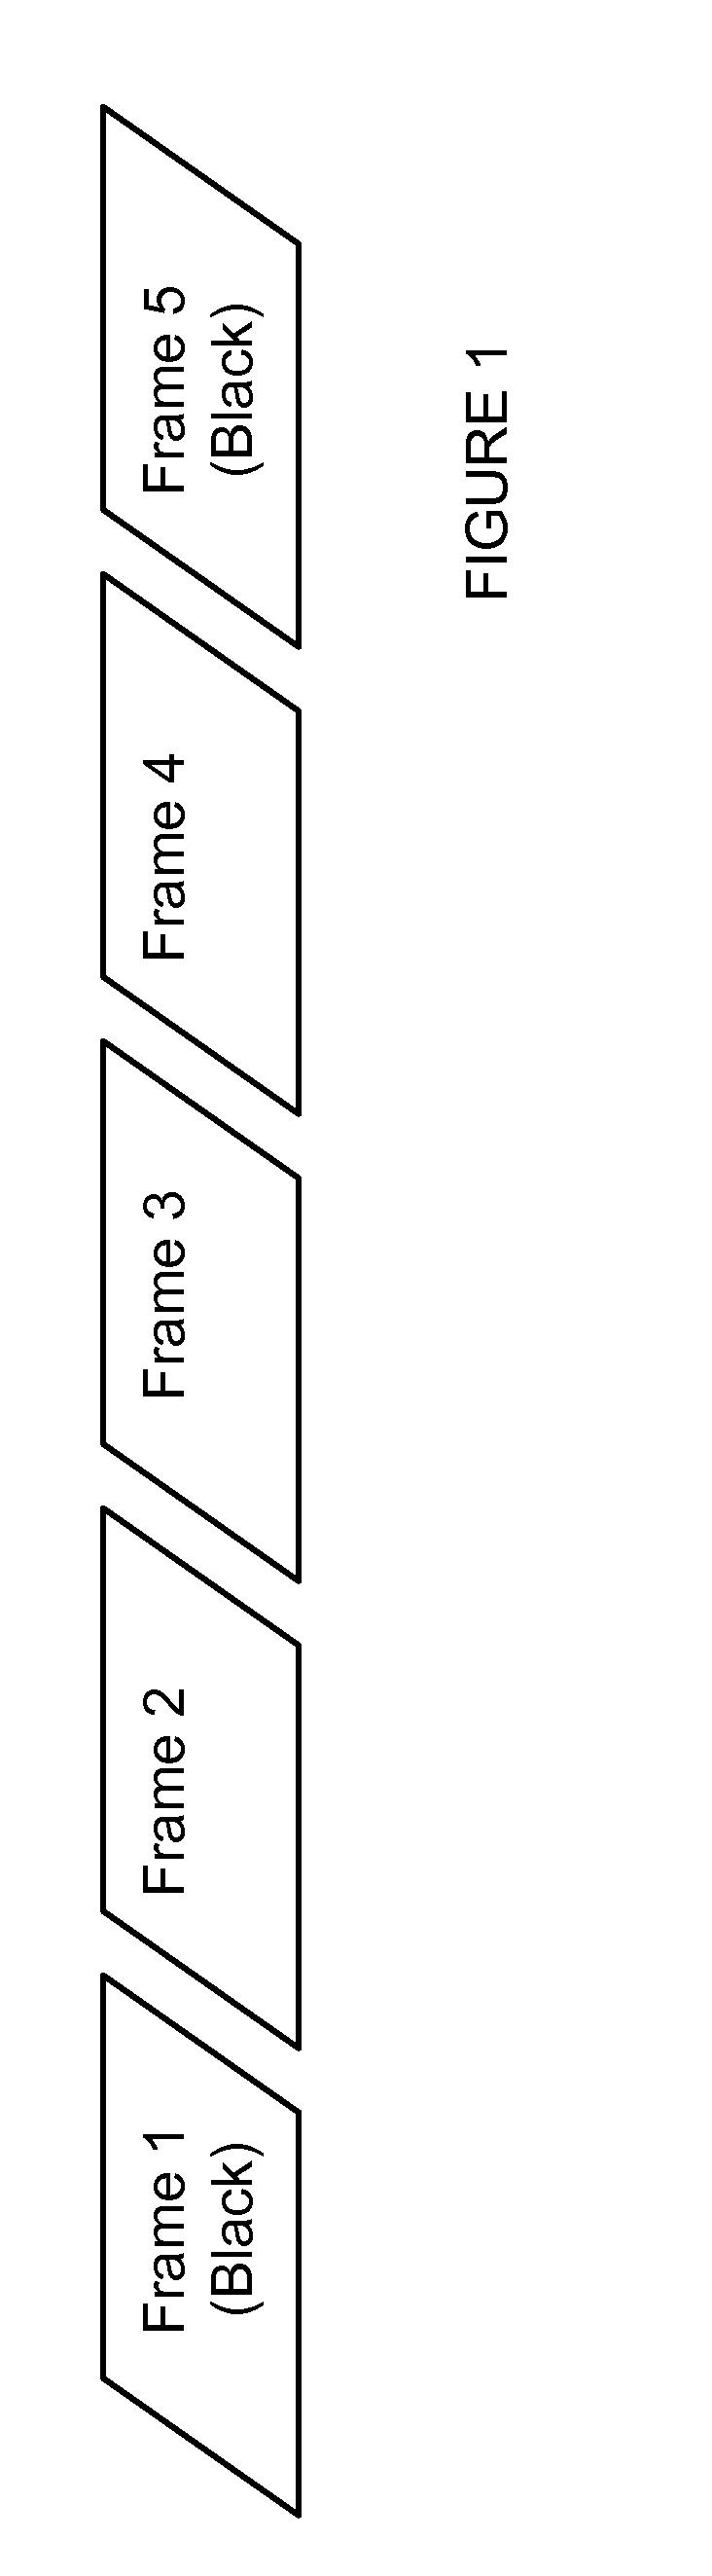 patent us20140118622 dct based black frame detection using